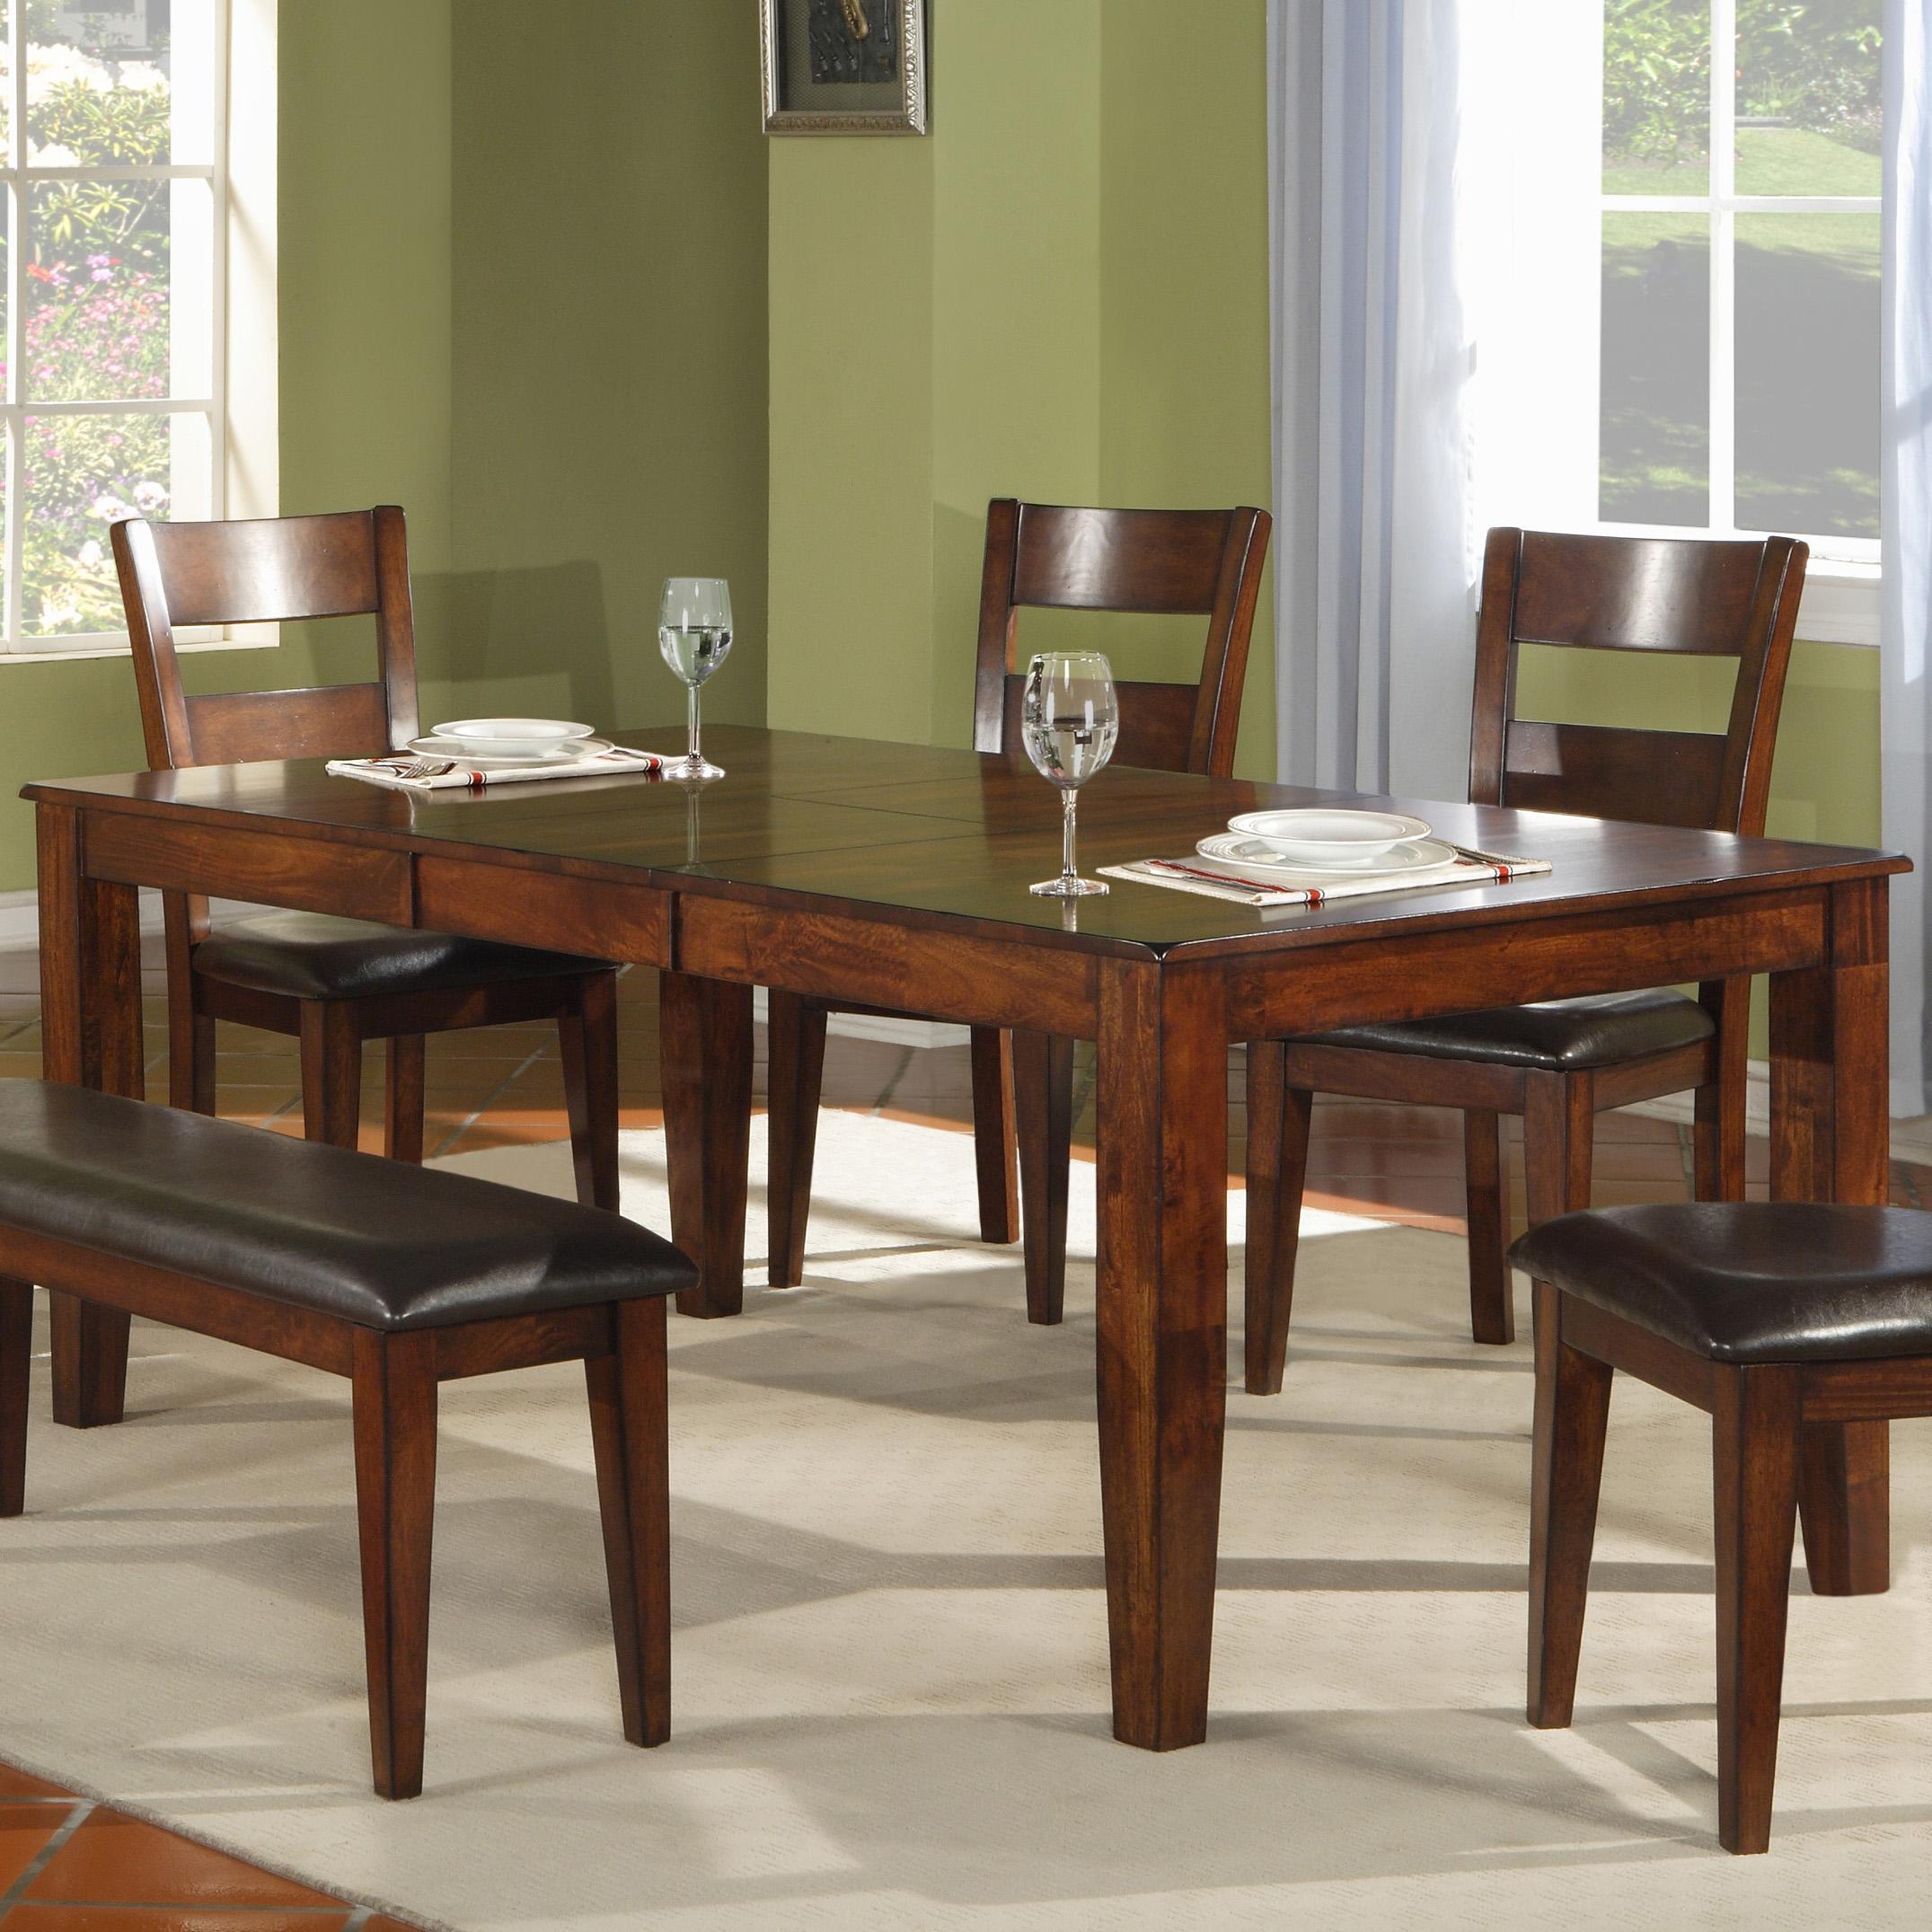 Morris Home Furnishings Melbourne Melbourne Dining Table - Item Number: 360120675